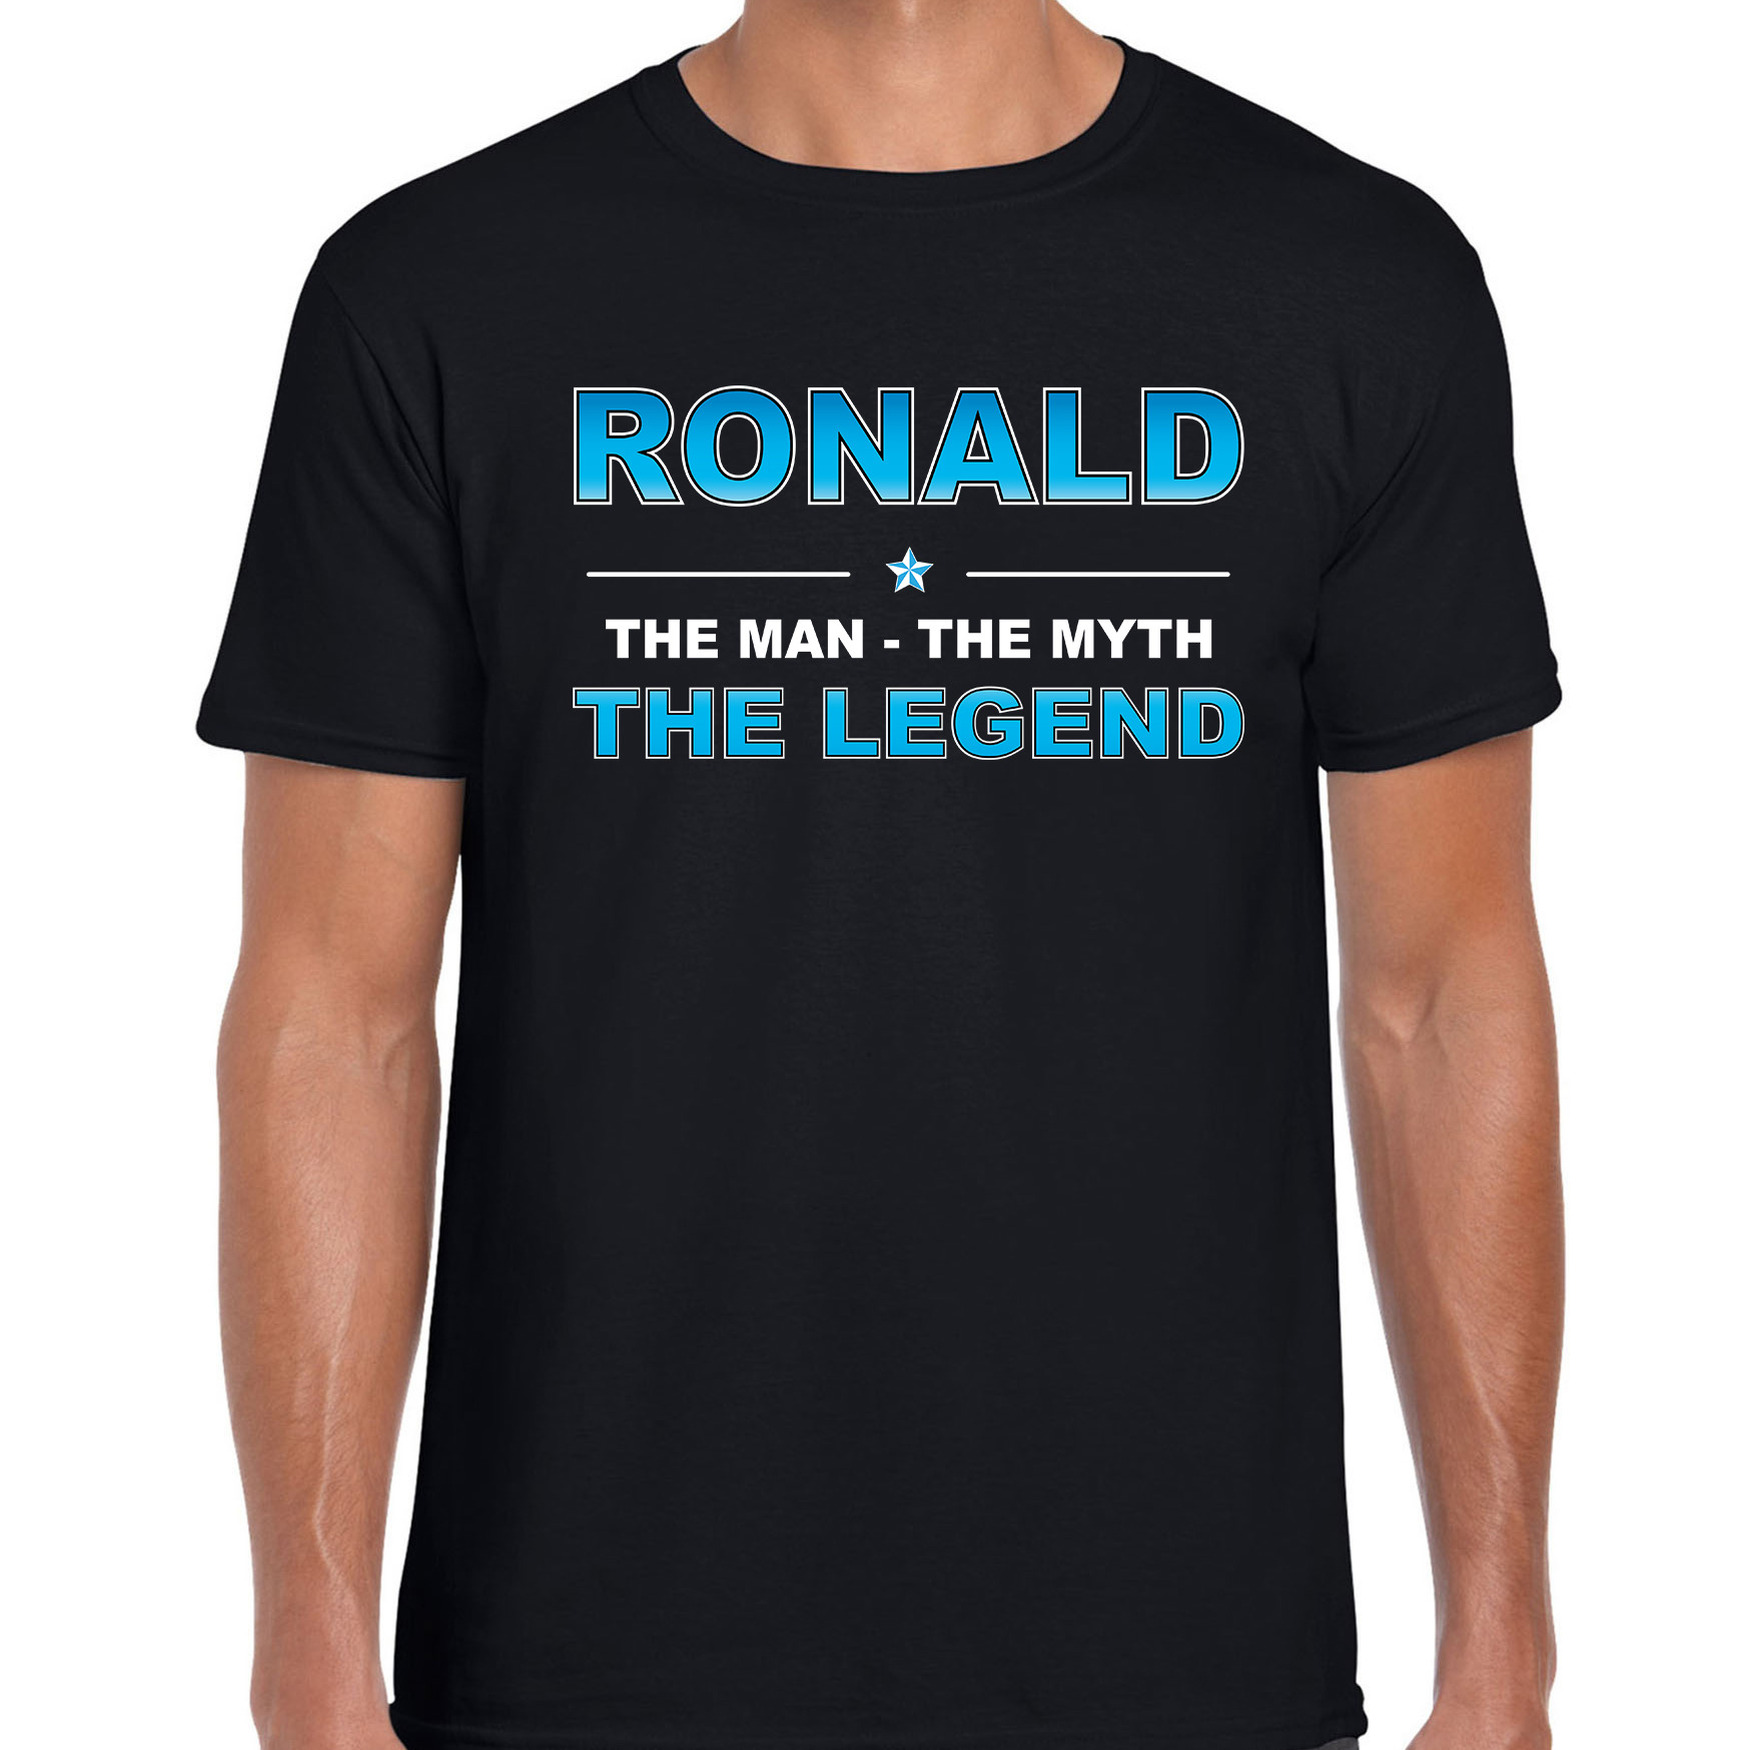 Naam cadeau t-shirt Ronald - the legend zwart voor heren